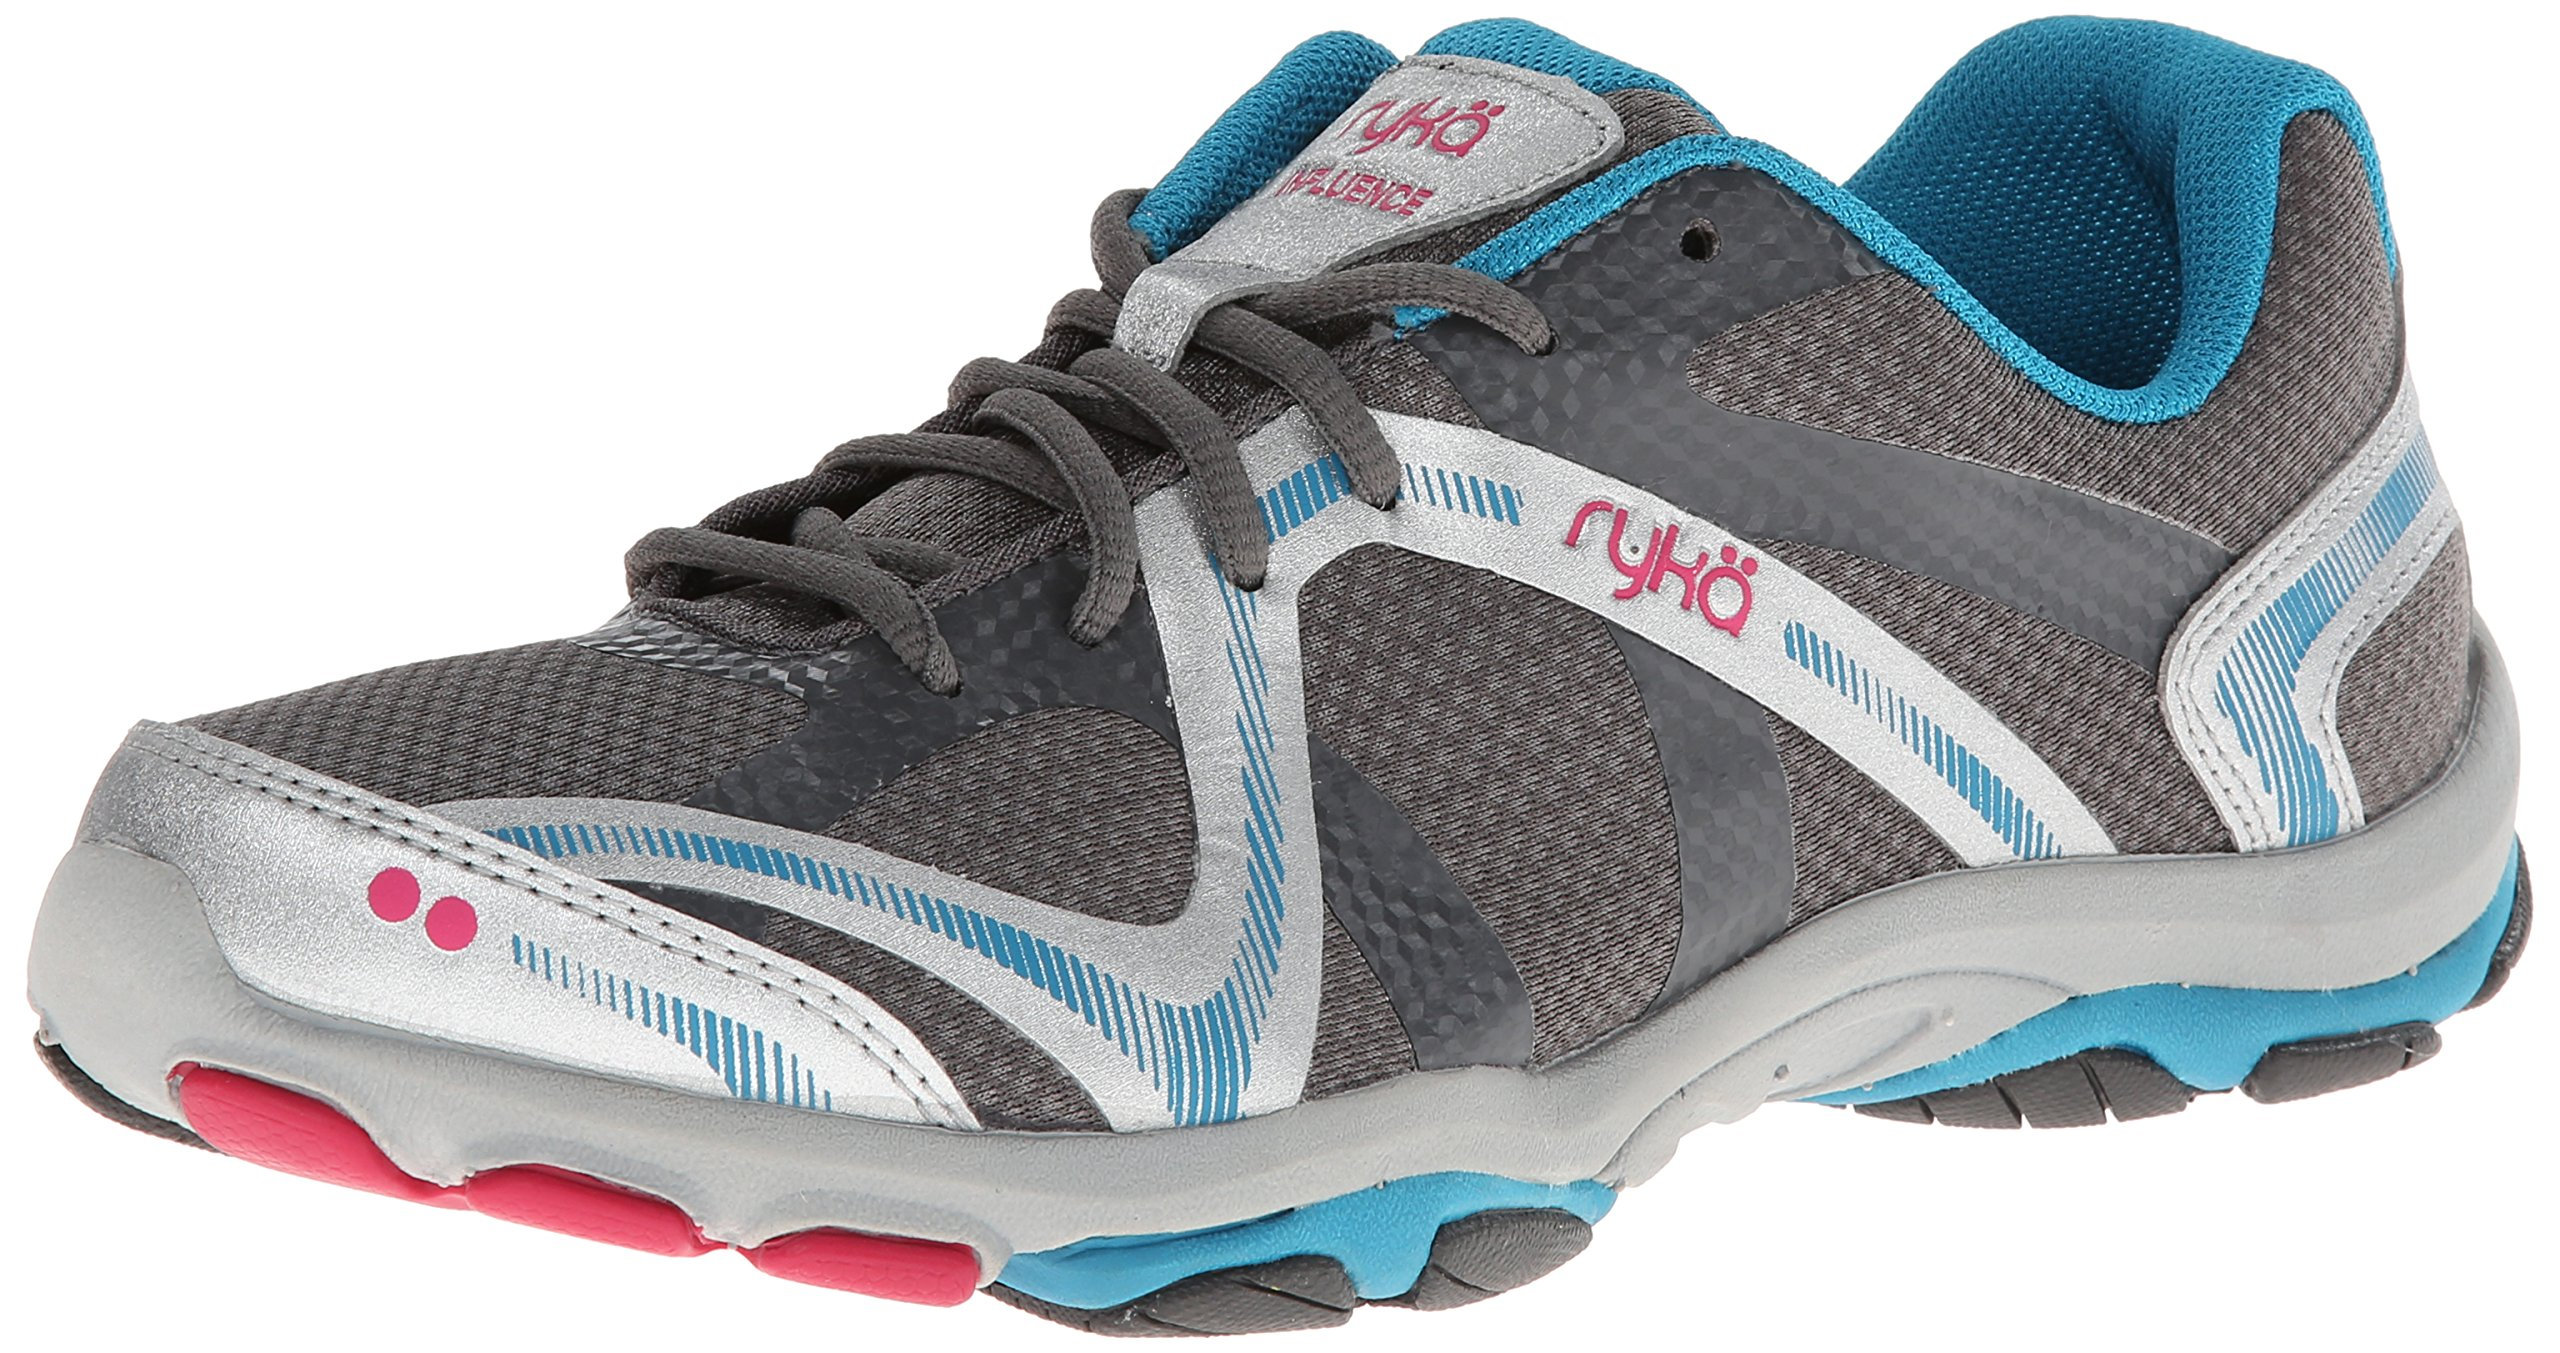 Ryka Women's Influence Training Shoe,Steel Grey/Chrome Silver/Diver Blue/Zuma Pink,9 M US